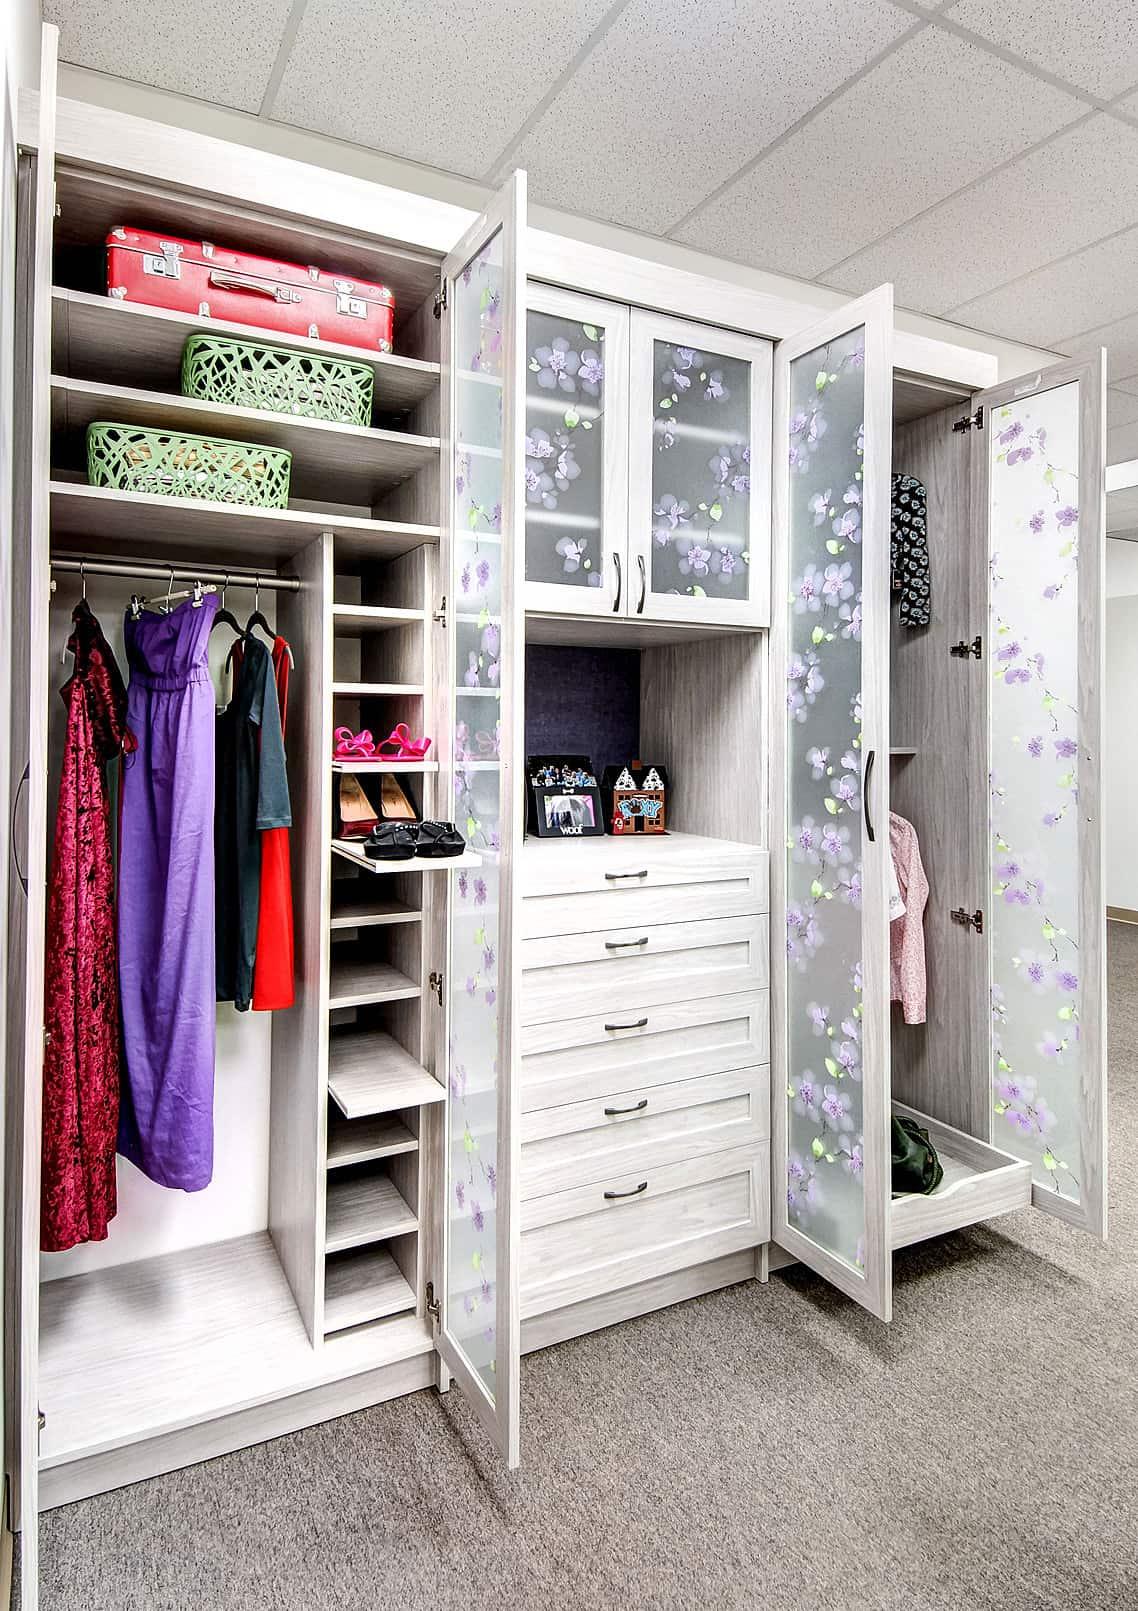 95 Bedroom Closet Ideas Photos